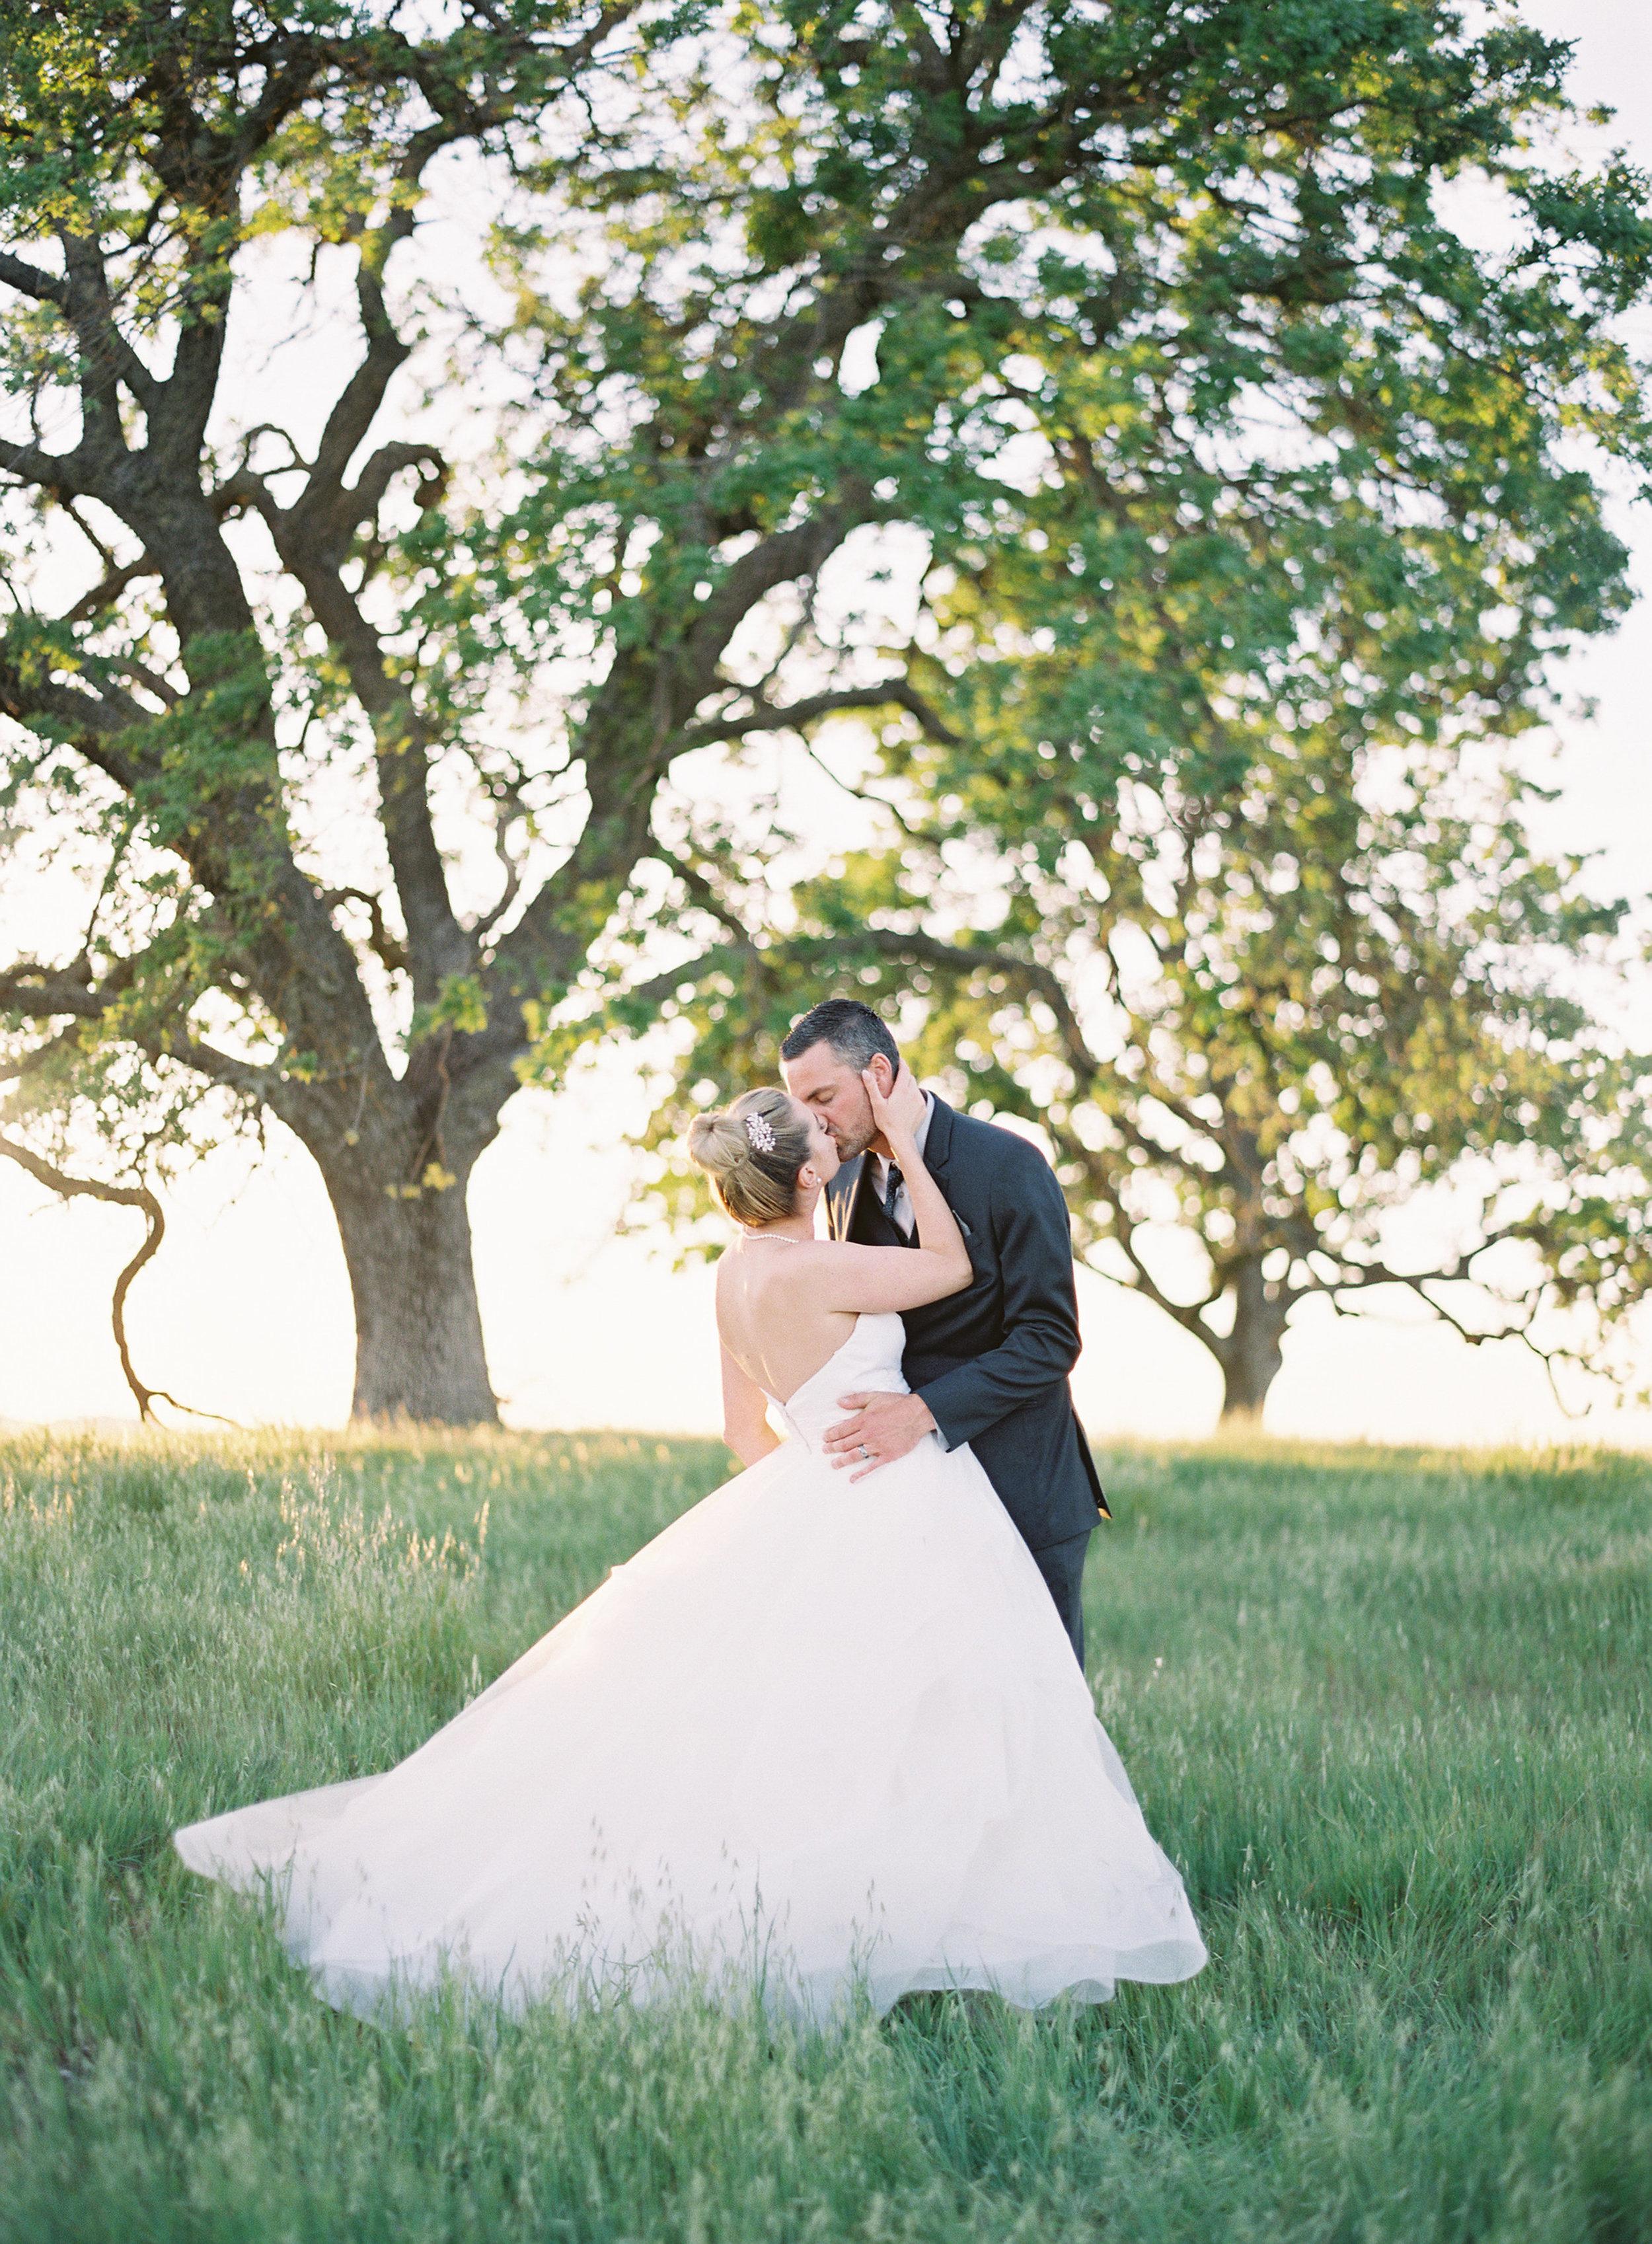 Paso-Robles-Wedding-Steven-Ashley-678.jpg